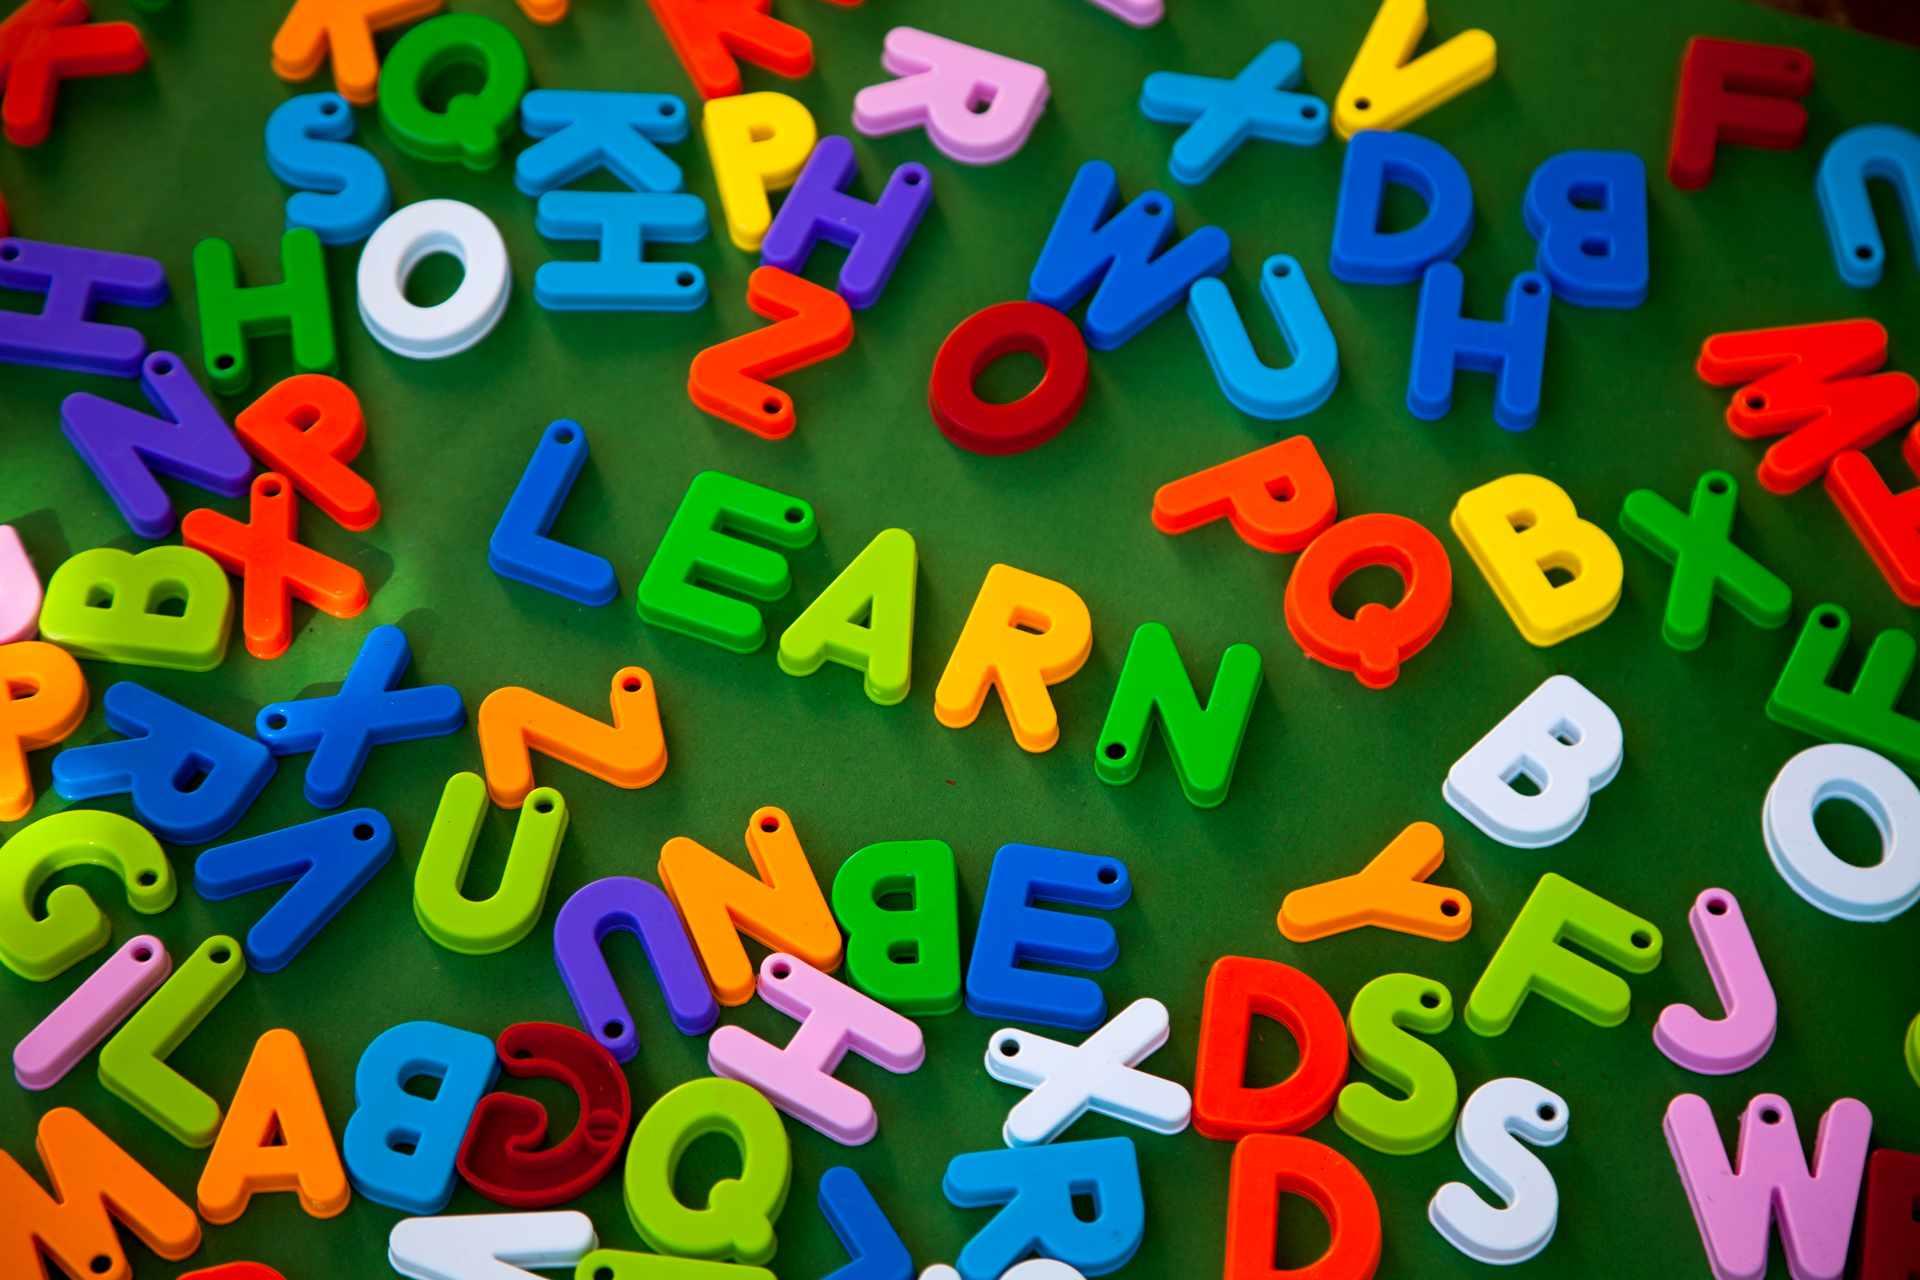 ABC letter magnets.